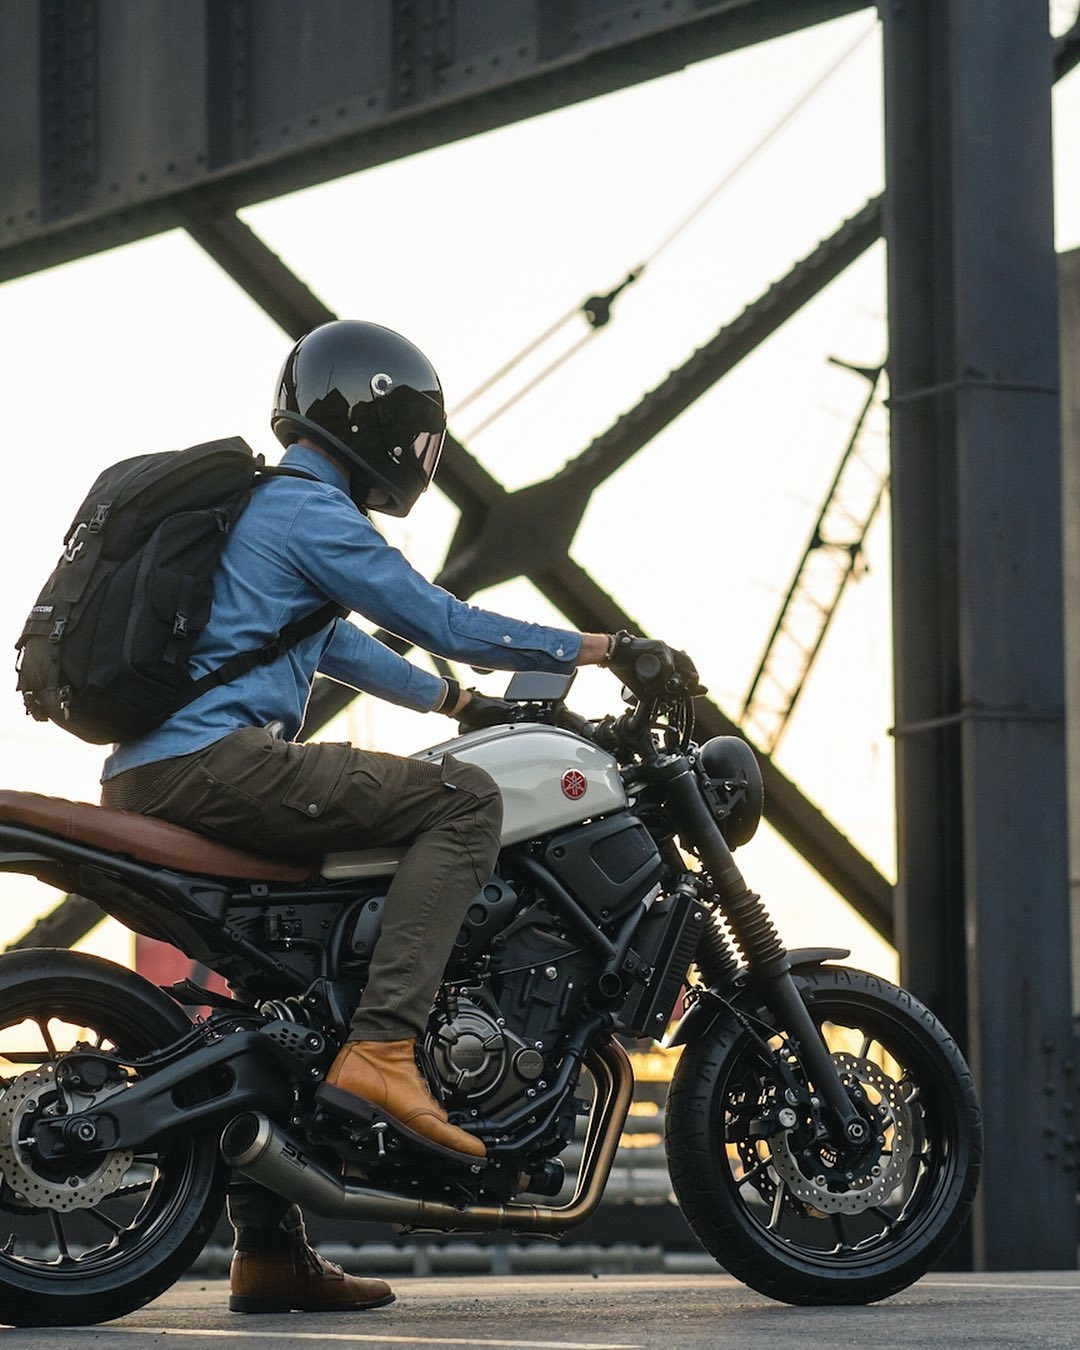 man riding yamaha motorcycle